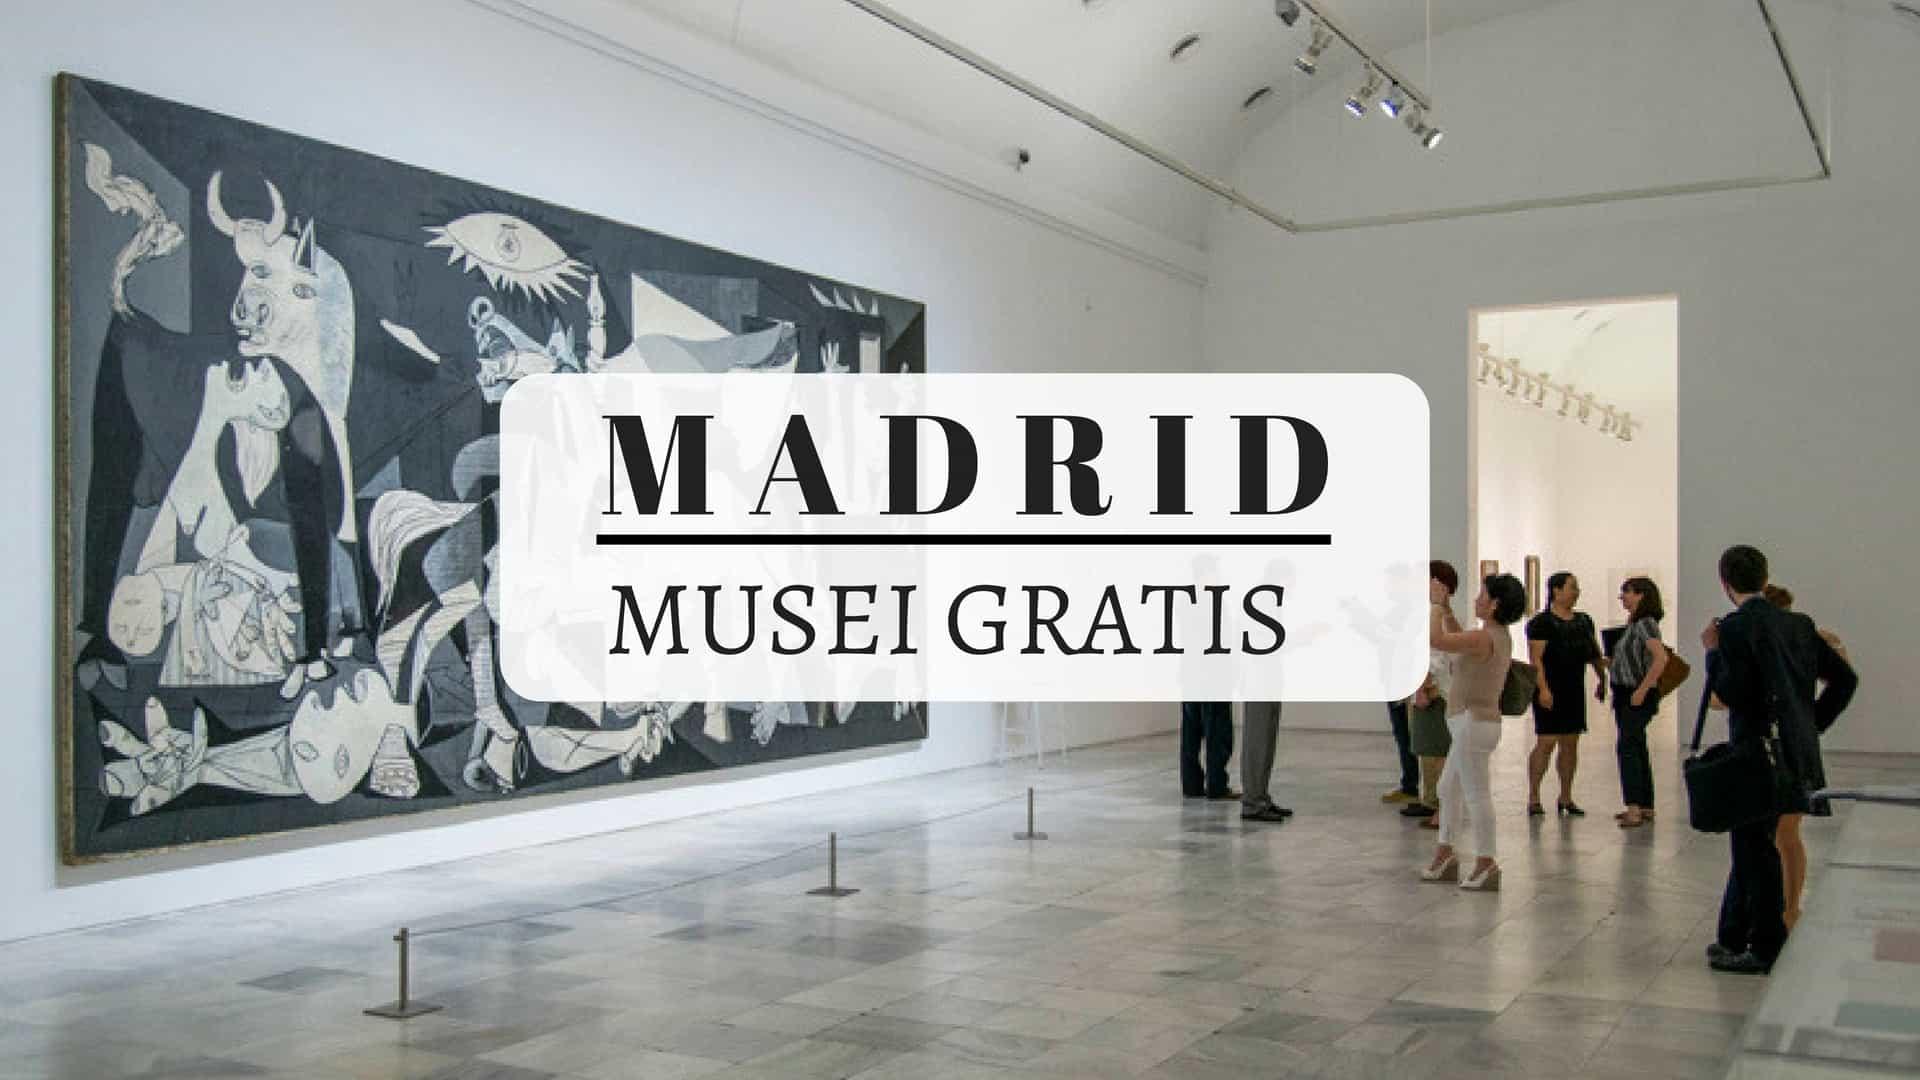 gratis dating app Spagna